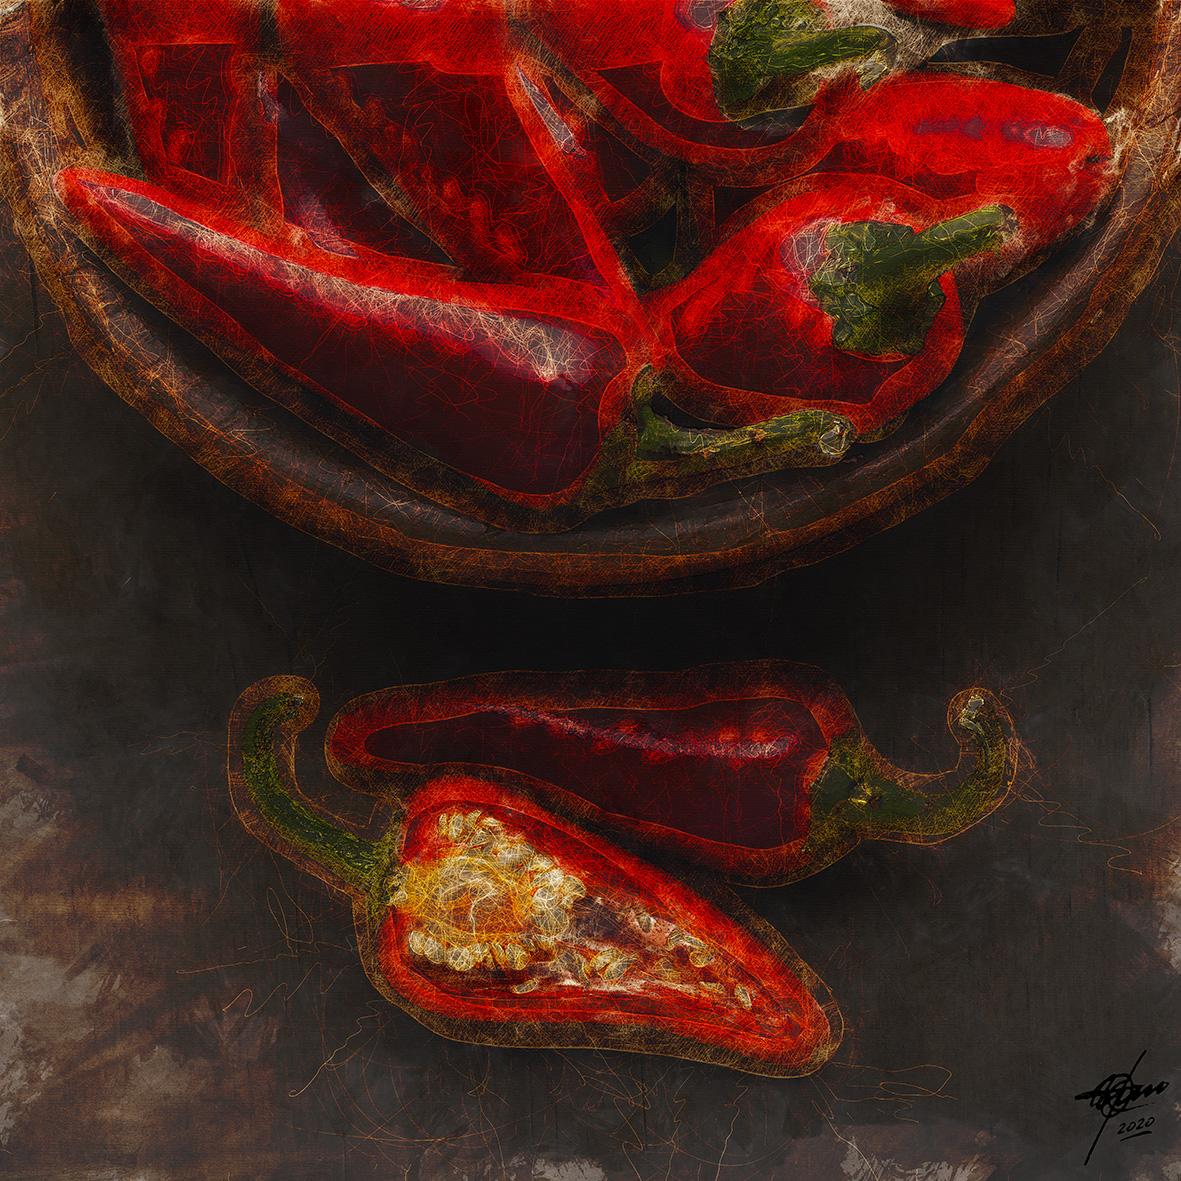 Red hot chillie (2020) - Osvaldo Russo Salles - Digital y con Arte